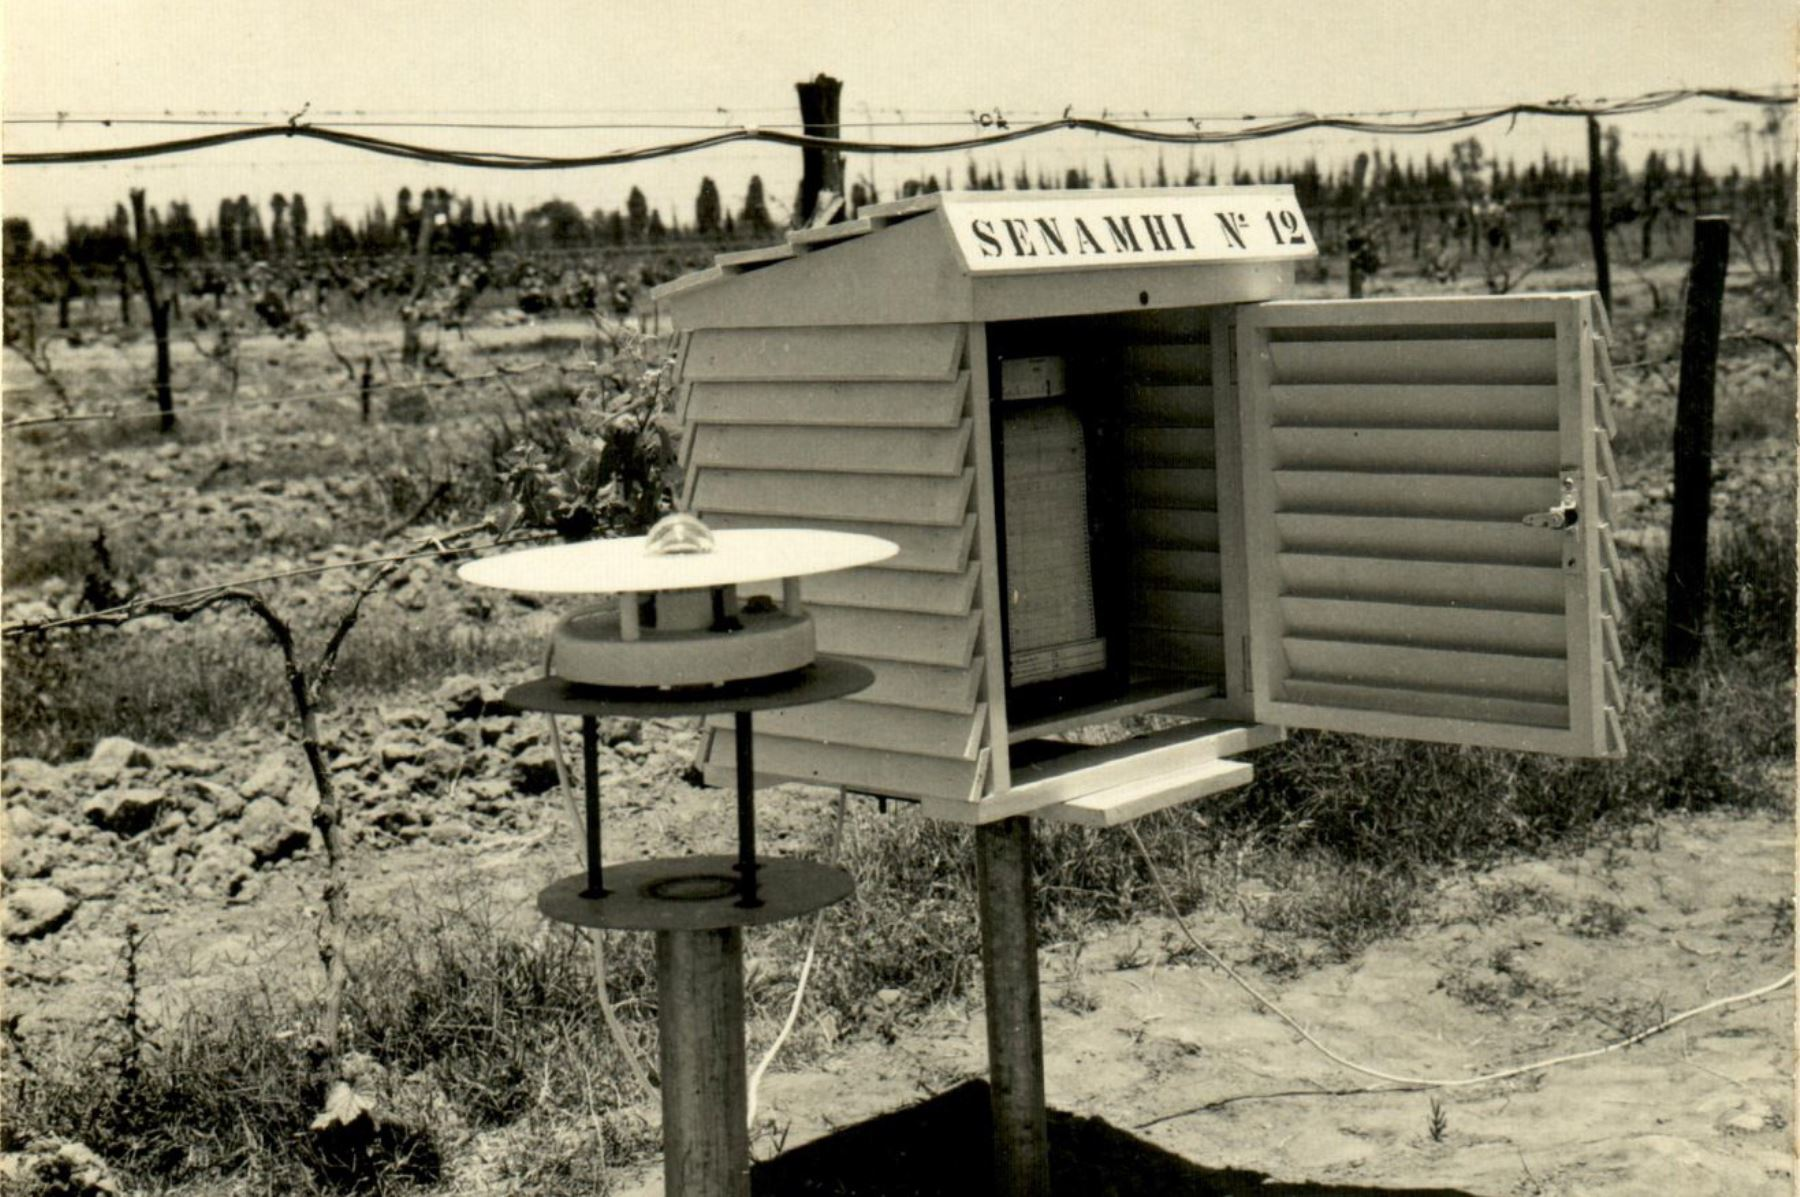 Estación antigua del Senamhi. Foto: Andina/difusión